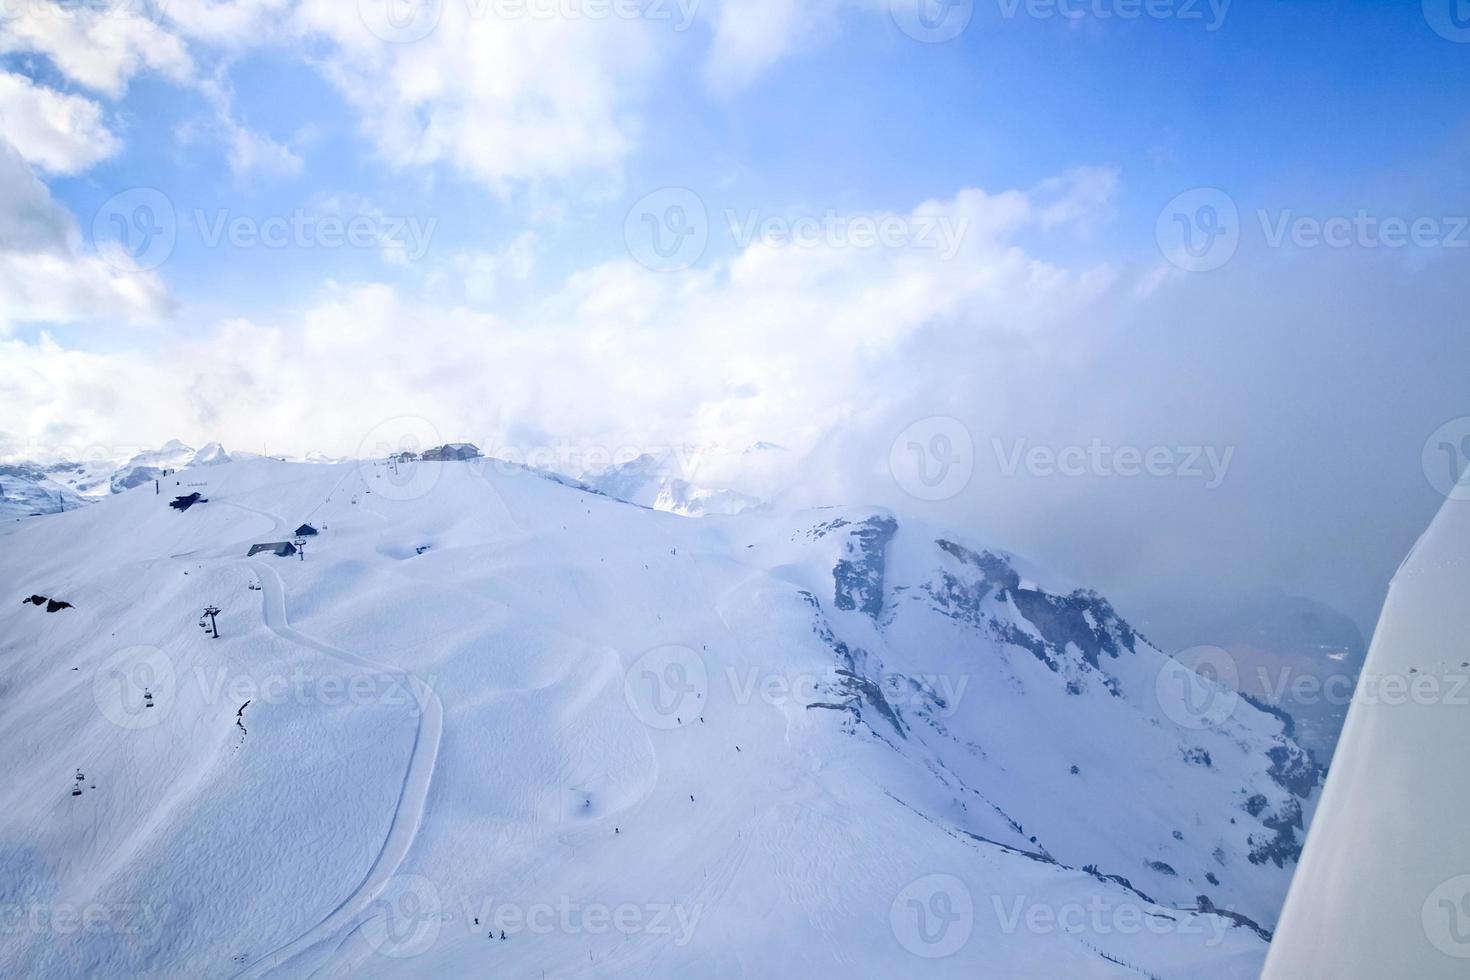 uniek vliegtuig luchtfoto van centraal Zwitserse Alpen skiresort foto